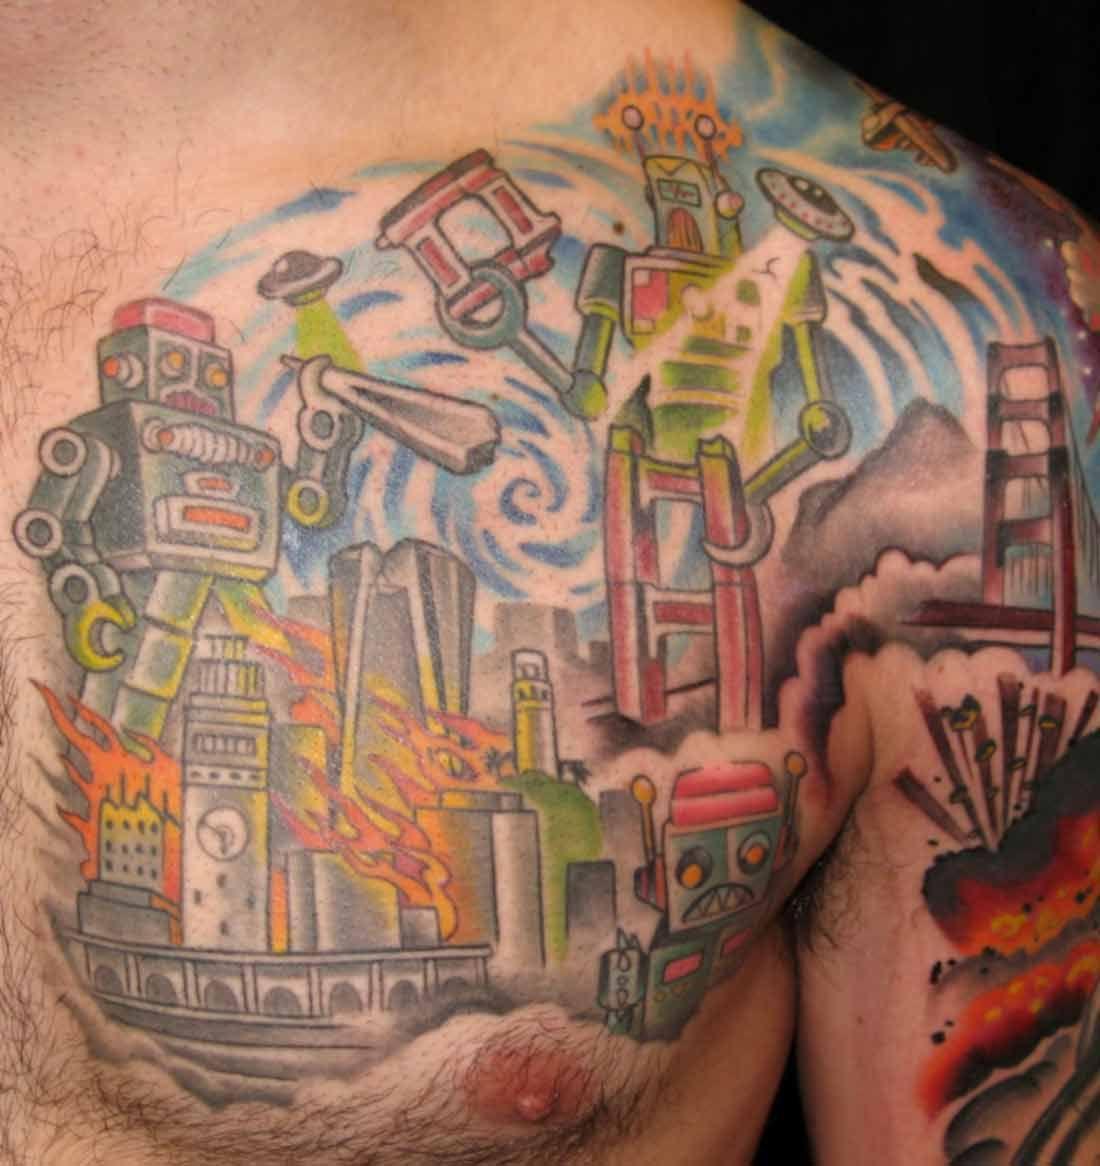 Robot Tattoo 2 Love It My Style Tattoos Biomechanical Tattoo